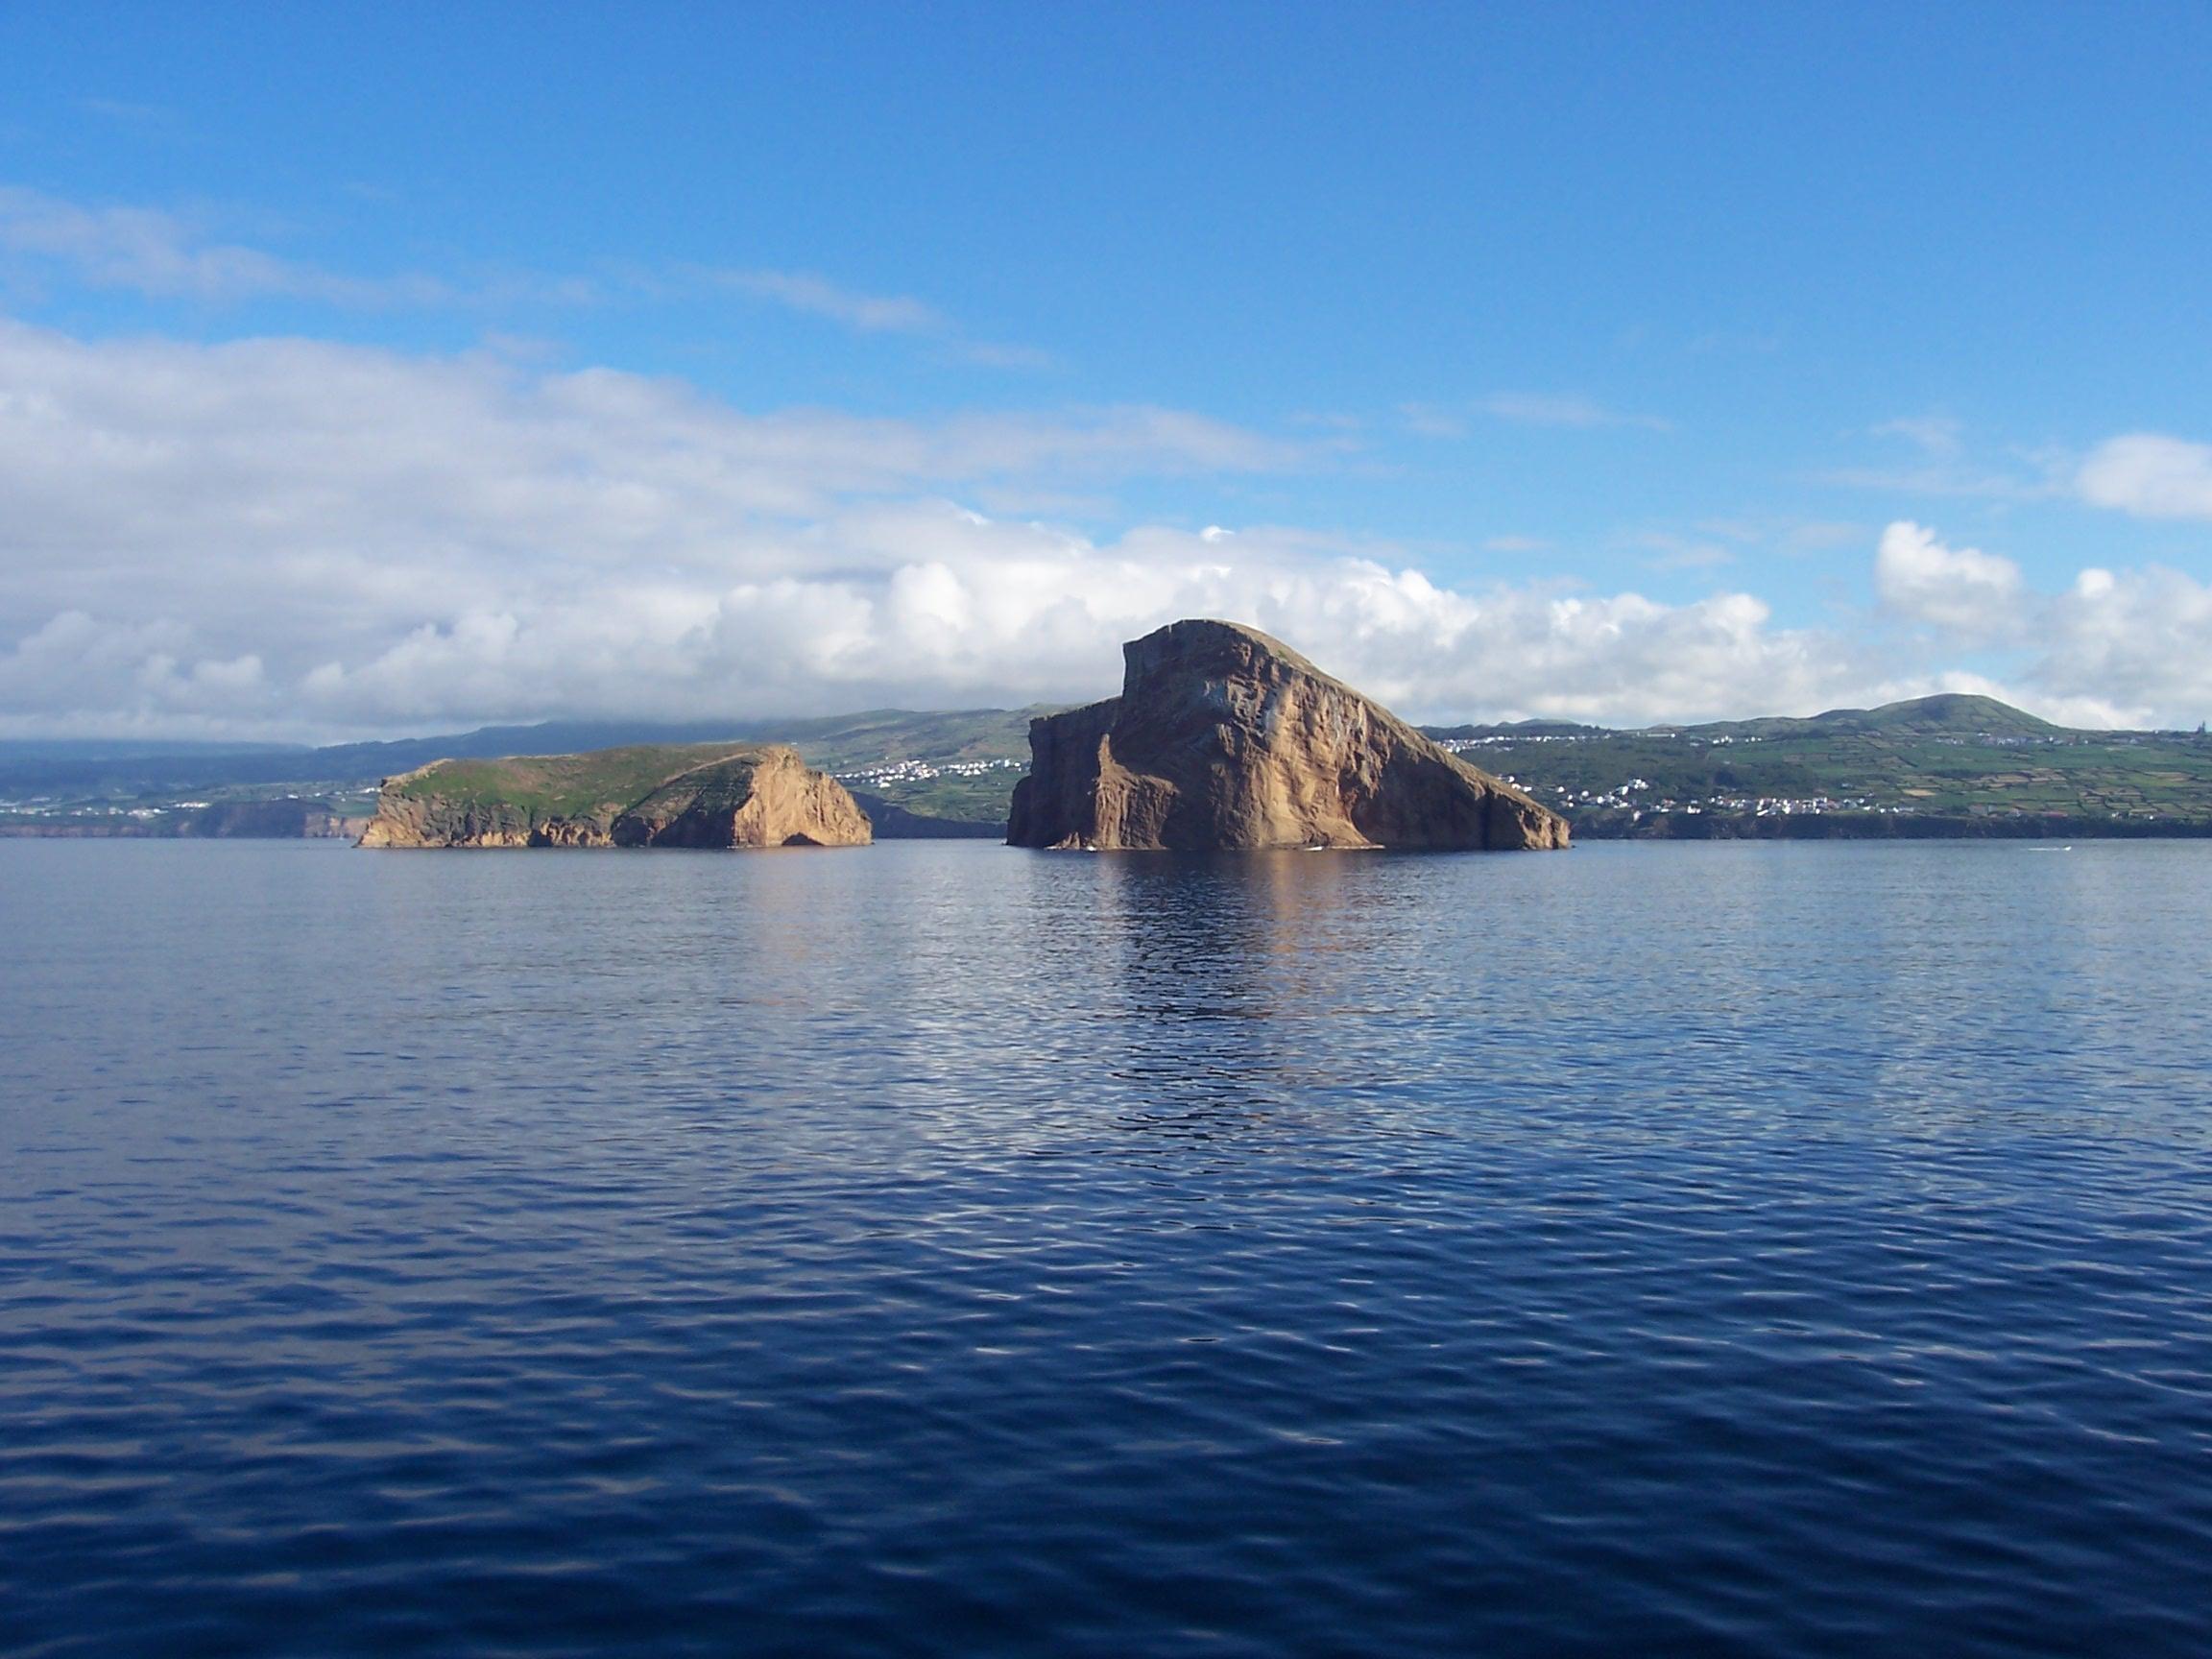 http://upload.wikimedia.org/wikipedia/commons/3/32/Ilh%C3%A9us_das_Cabras,_vistos_do_Mar,_ilha_Terceira,_A%C3%A7ores,_2.JPG